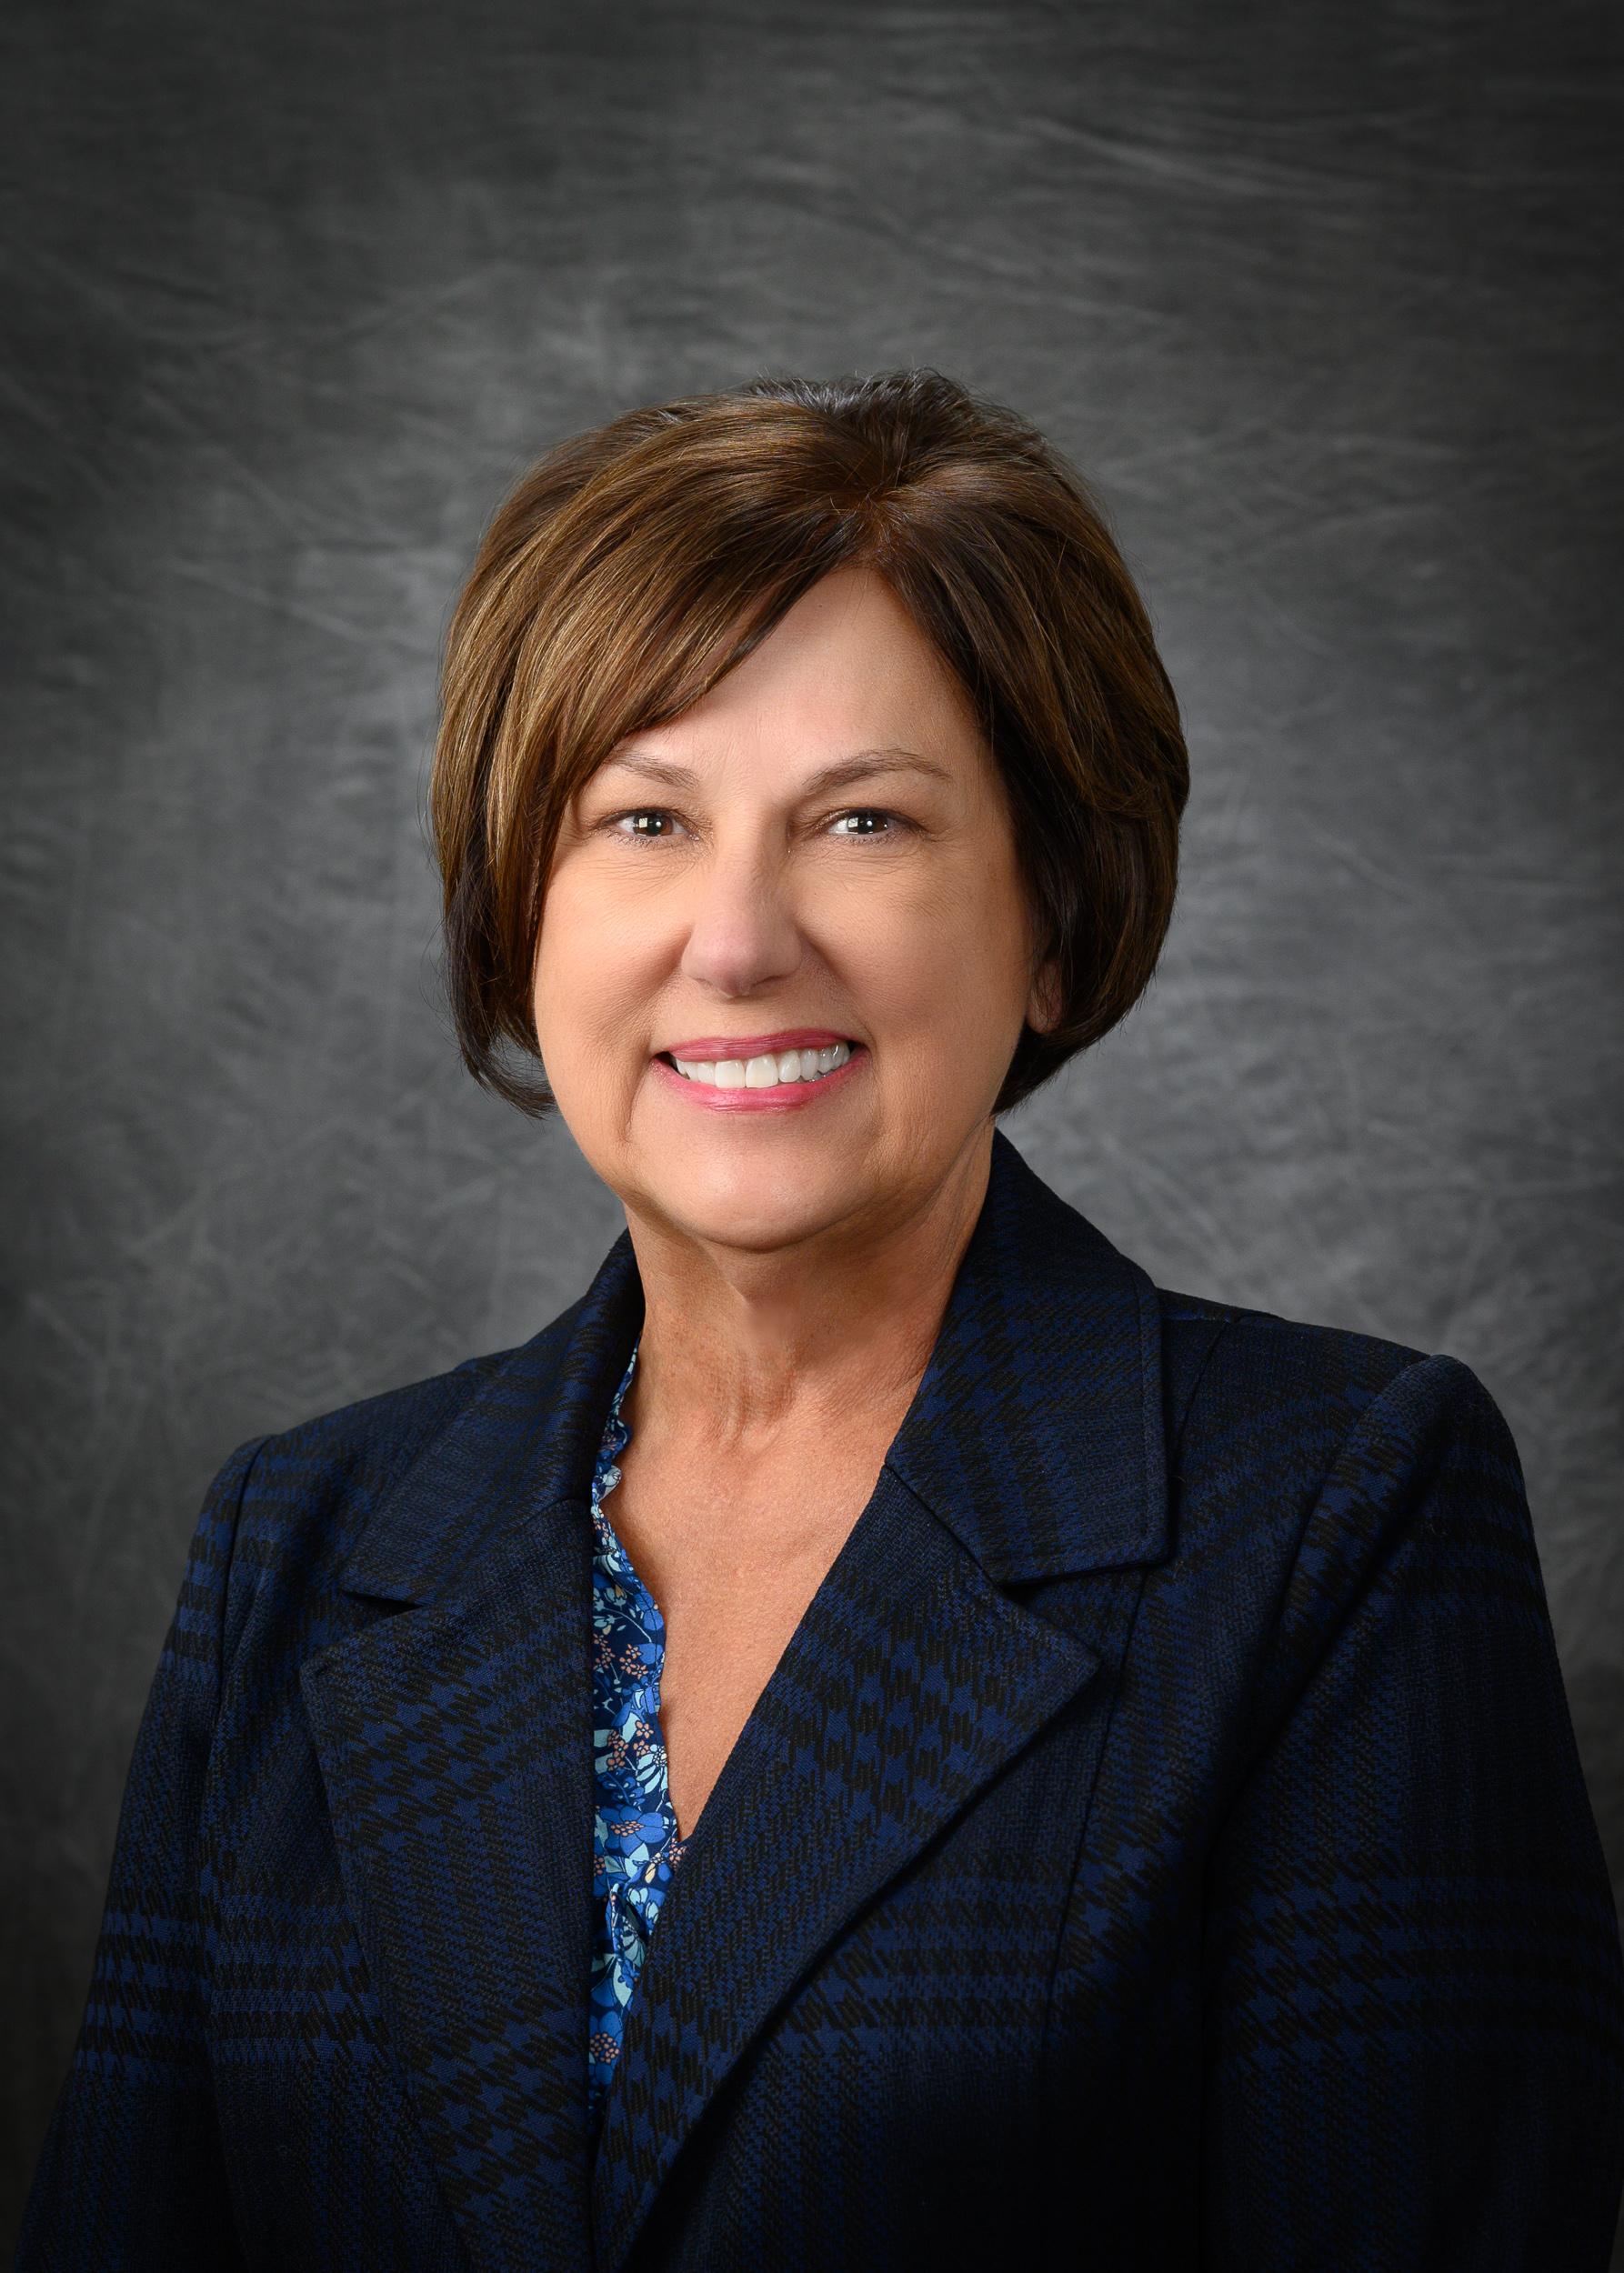 Karen L. Sirrine